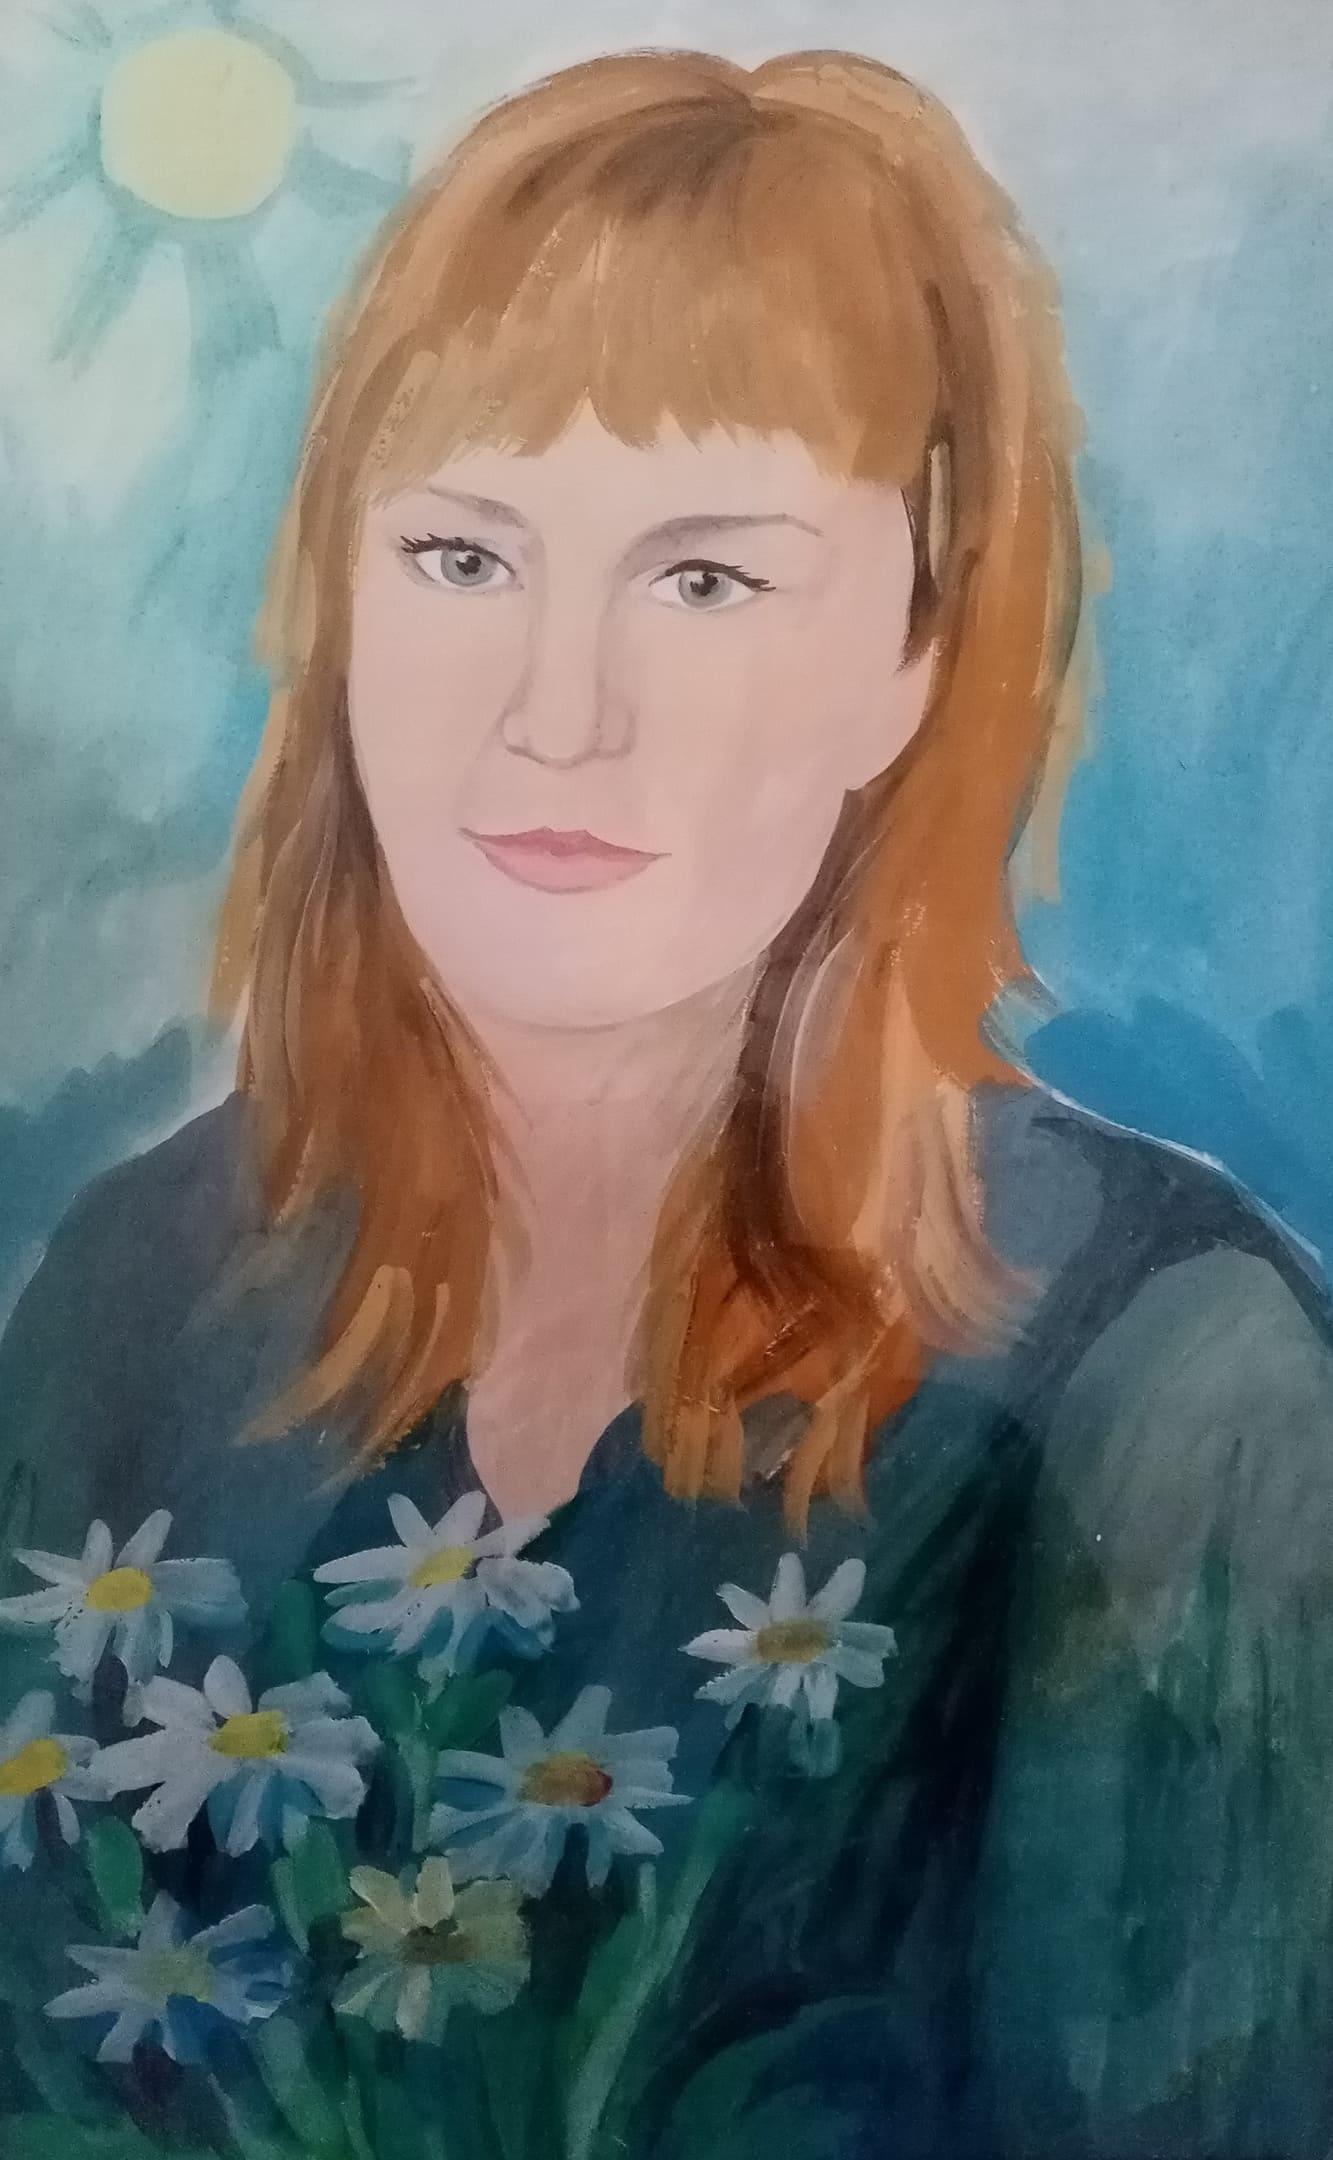 Ширшова Лена 14 лет